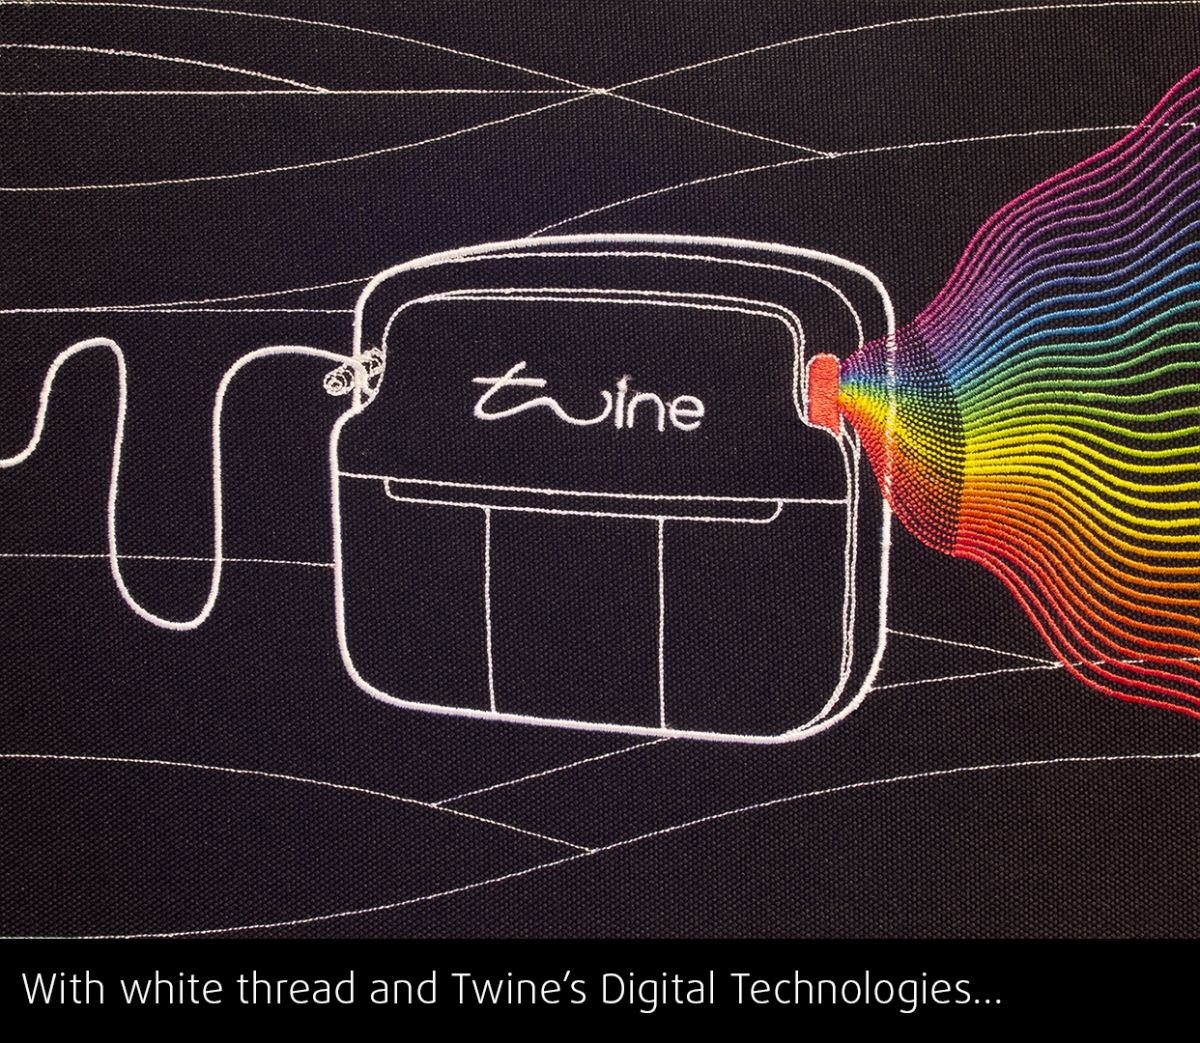 inline_660_https://printguide.info/images/2018/11/twine_gradient_yp7h.jpg